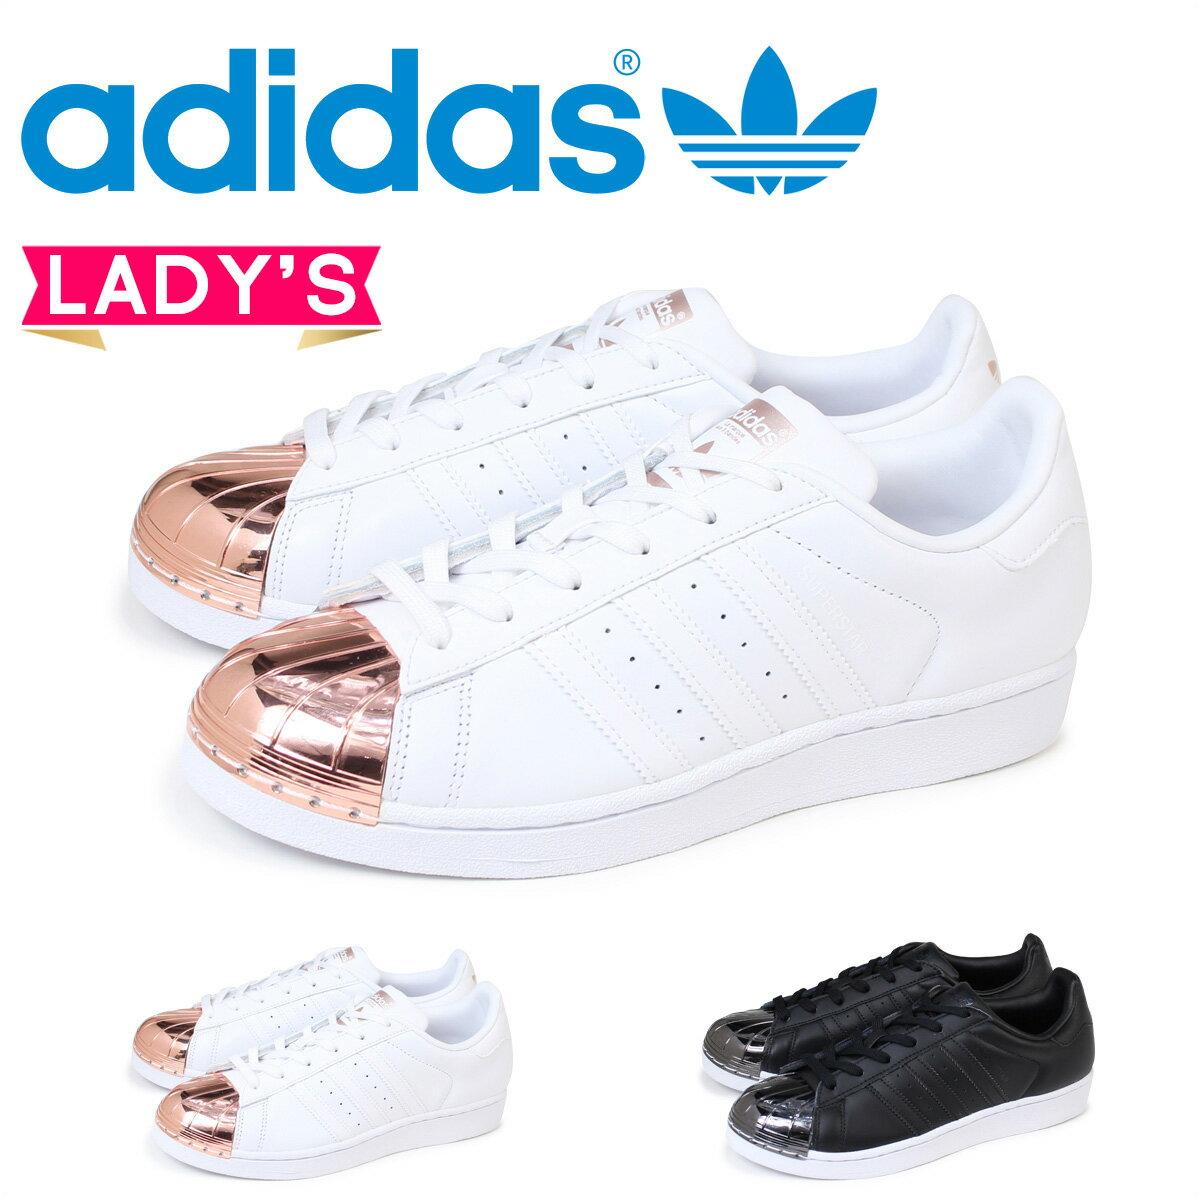 adidas Originals スーパースター レディース スニーカー アディダス オリジナルス SUPERSTAR METAL TOE W BY2882 BY2883 靴 ホワイト ブラック オリジナルス [171]